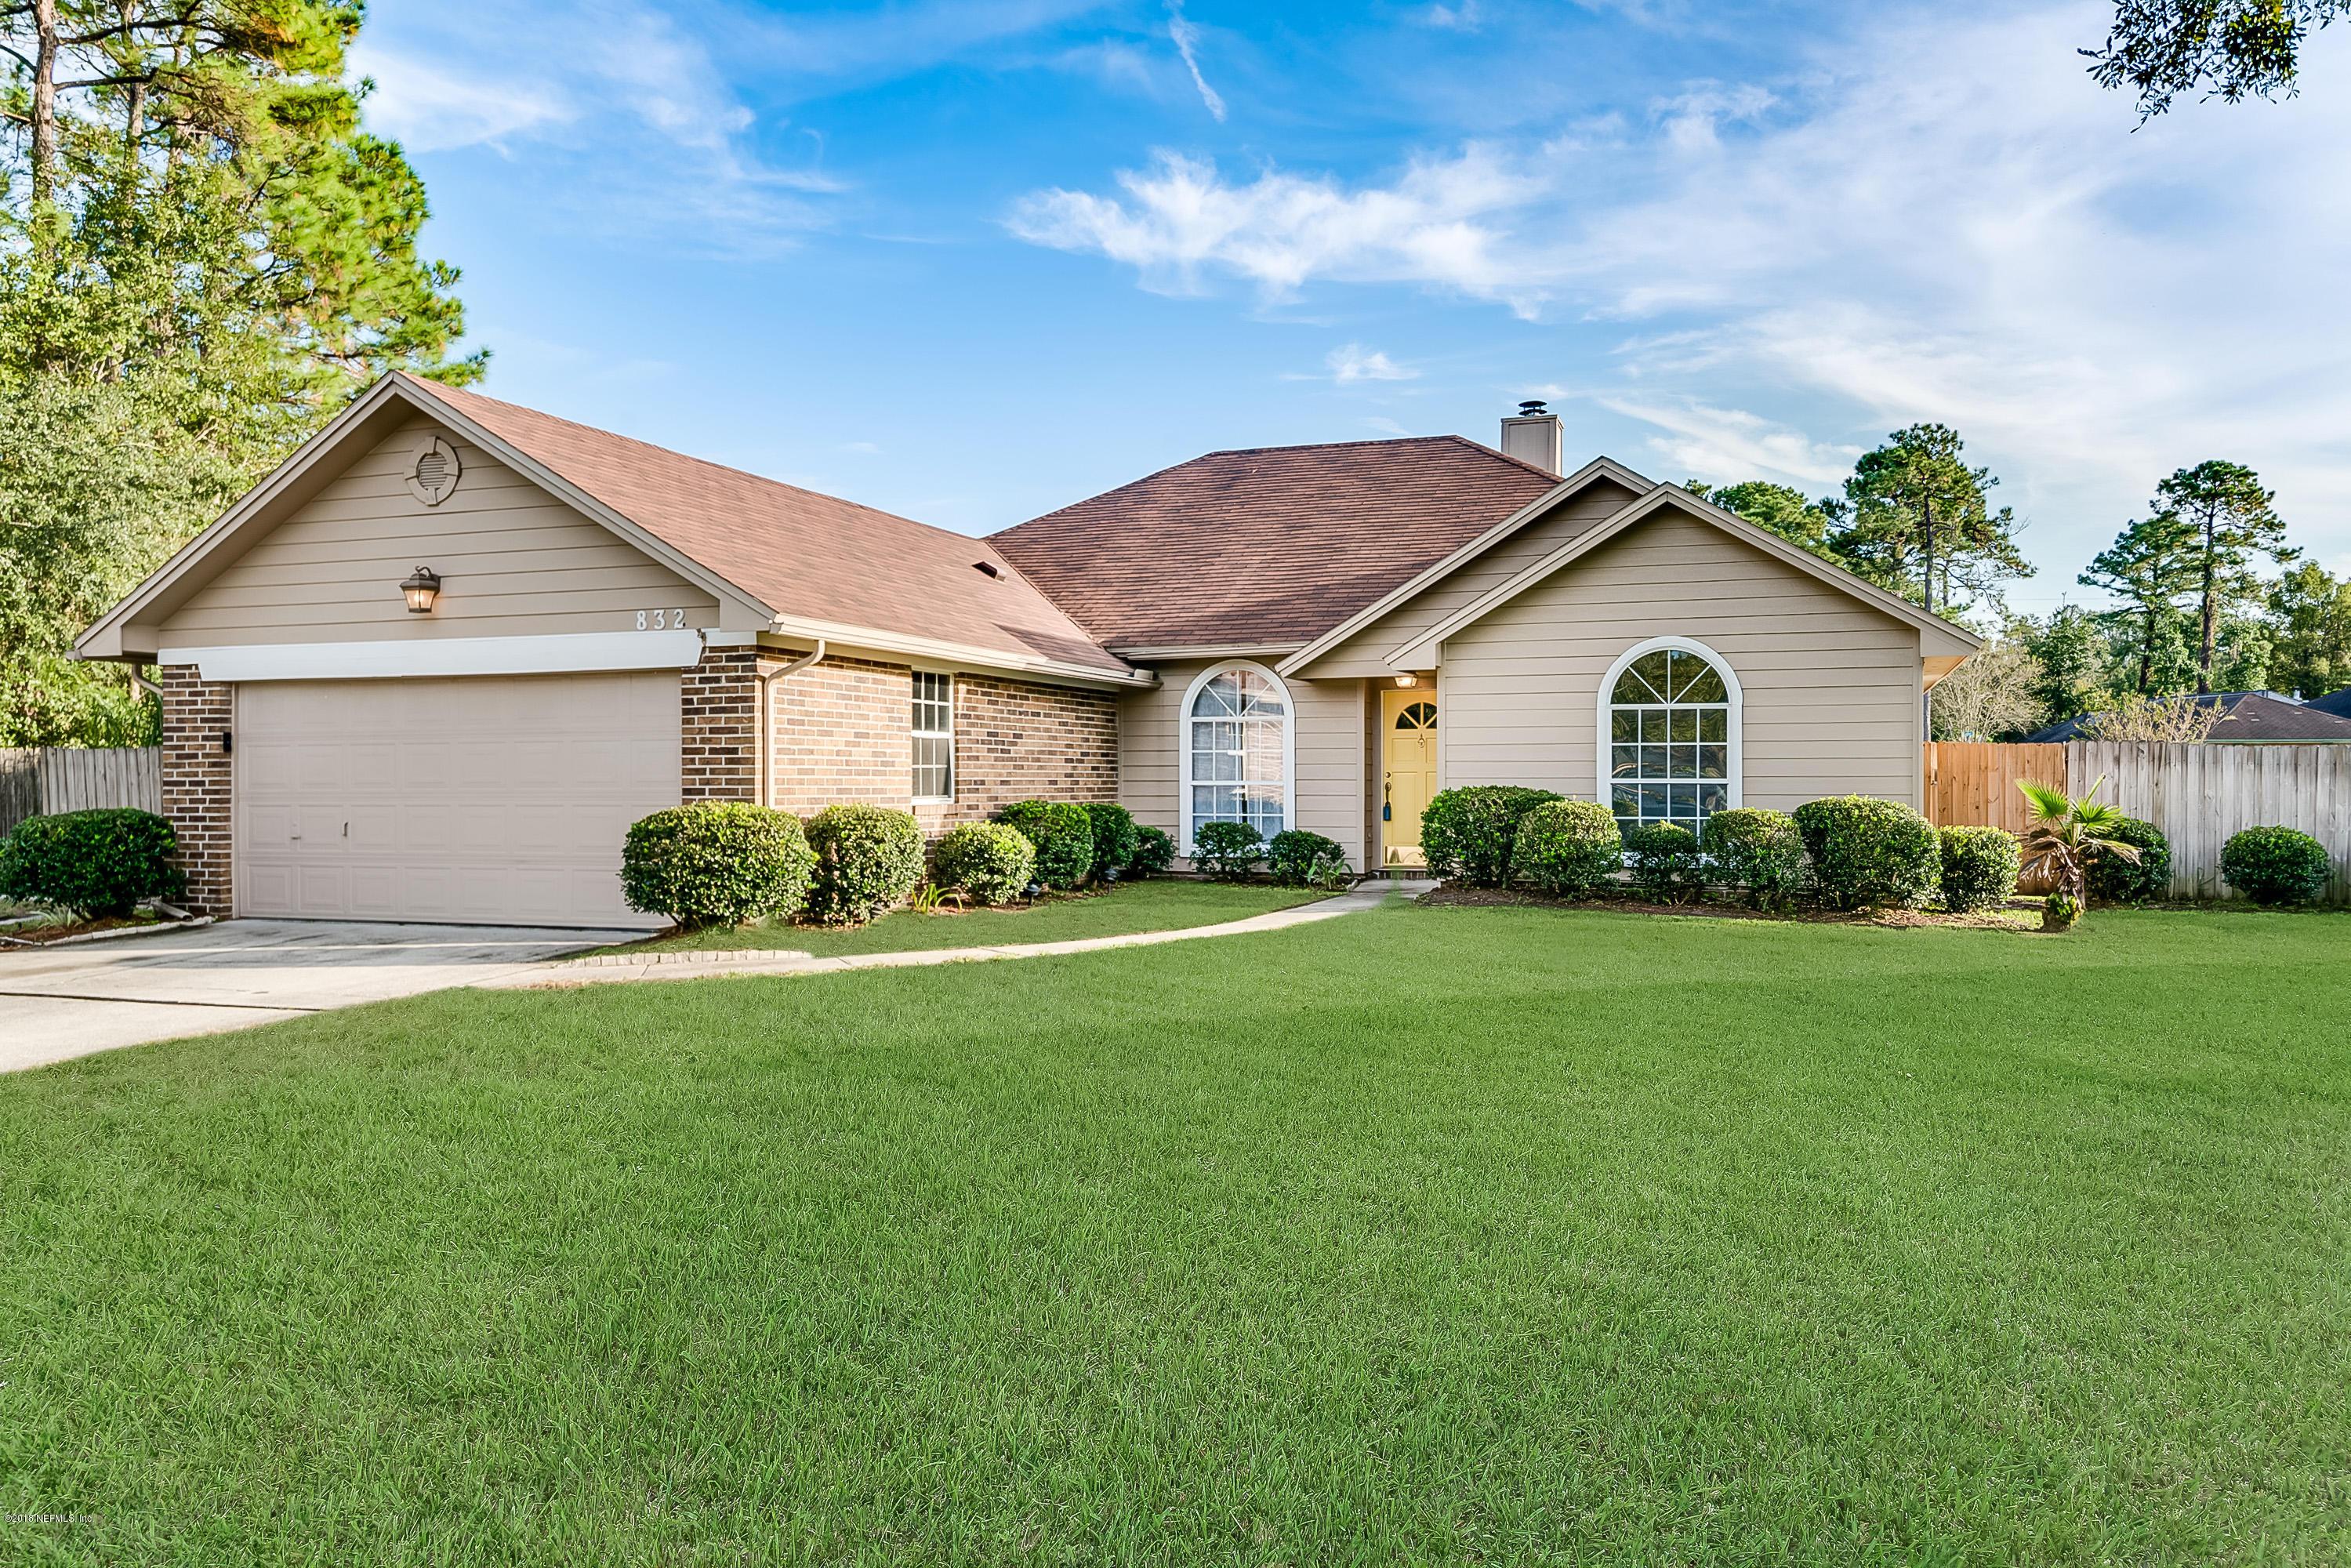 832 WICKLOW, ORANGE PARK, FLORIDA 32065, 4 Bedrooms Bedrooms, ,2 BathroomsBathrooms,Residential - single family,For sale,WICKLOW,968481